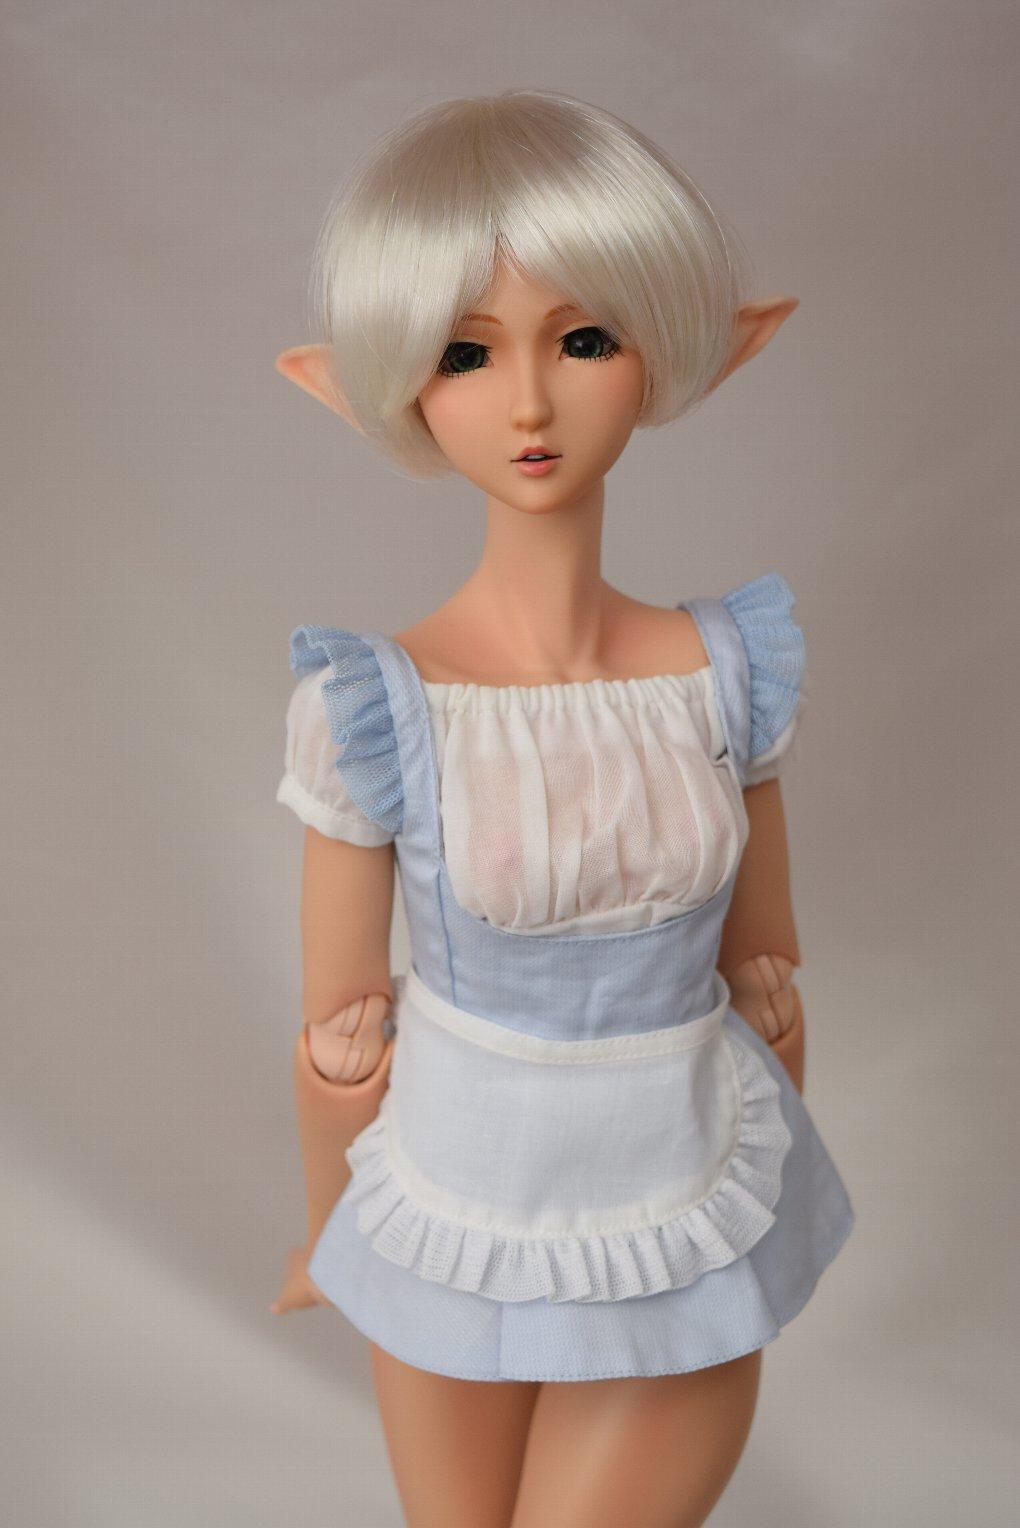 doll_3722.jpg